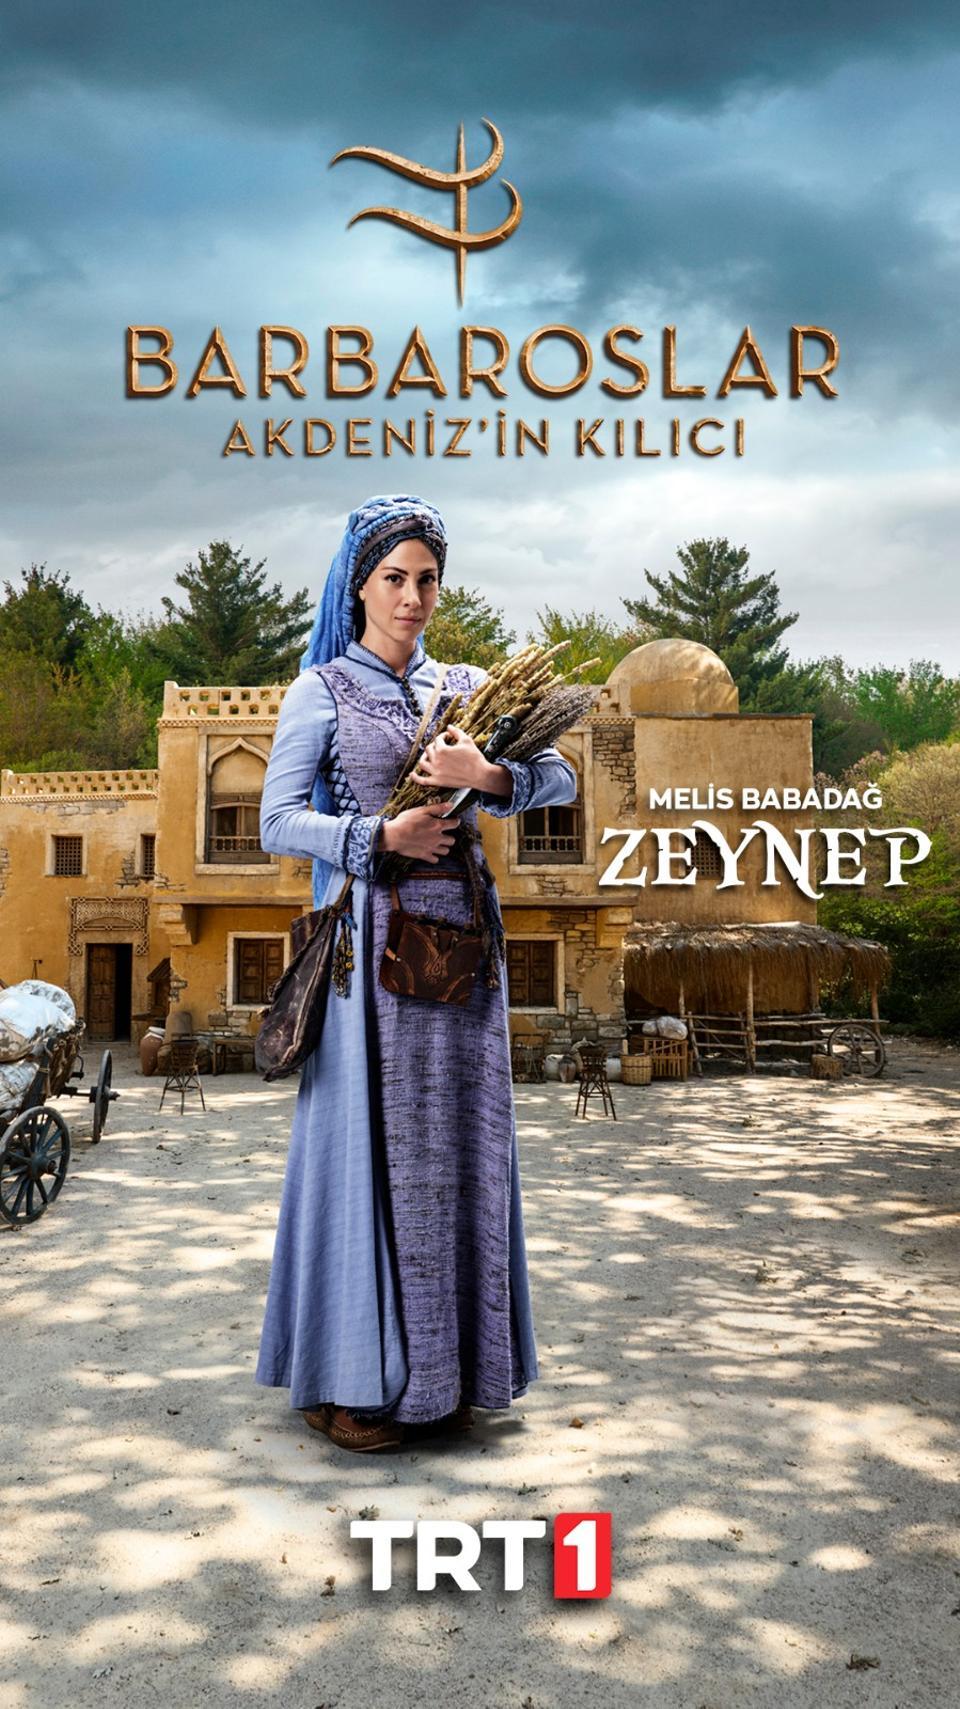 Zeynep is a swashbuckling healer with secrets in her past.